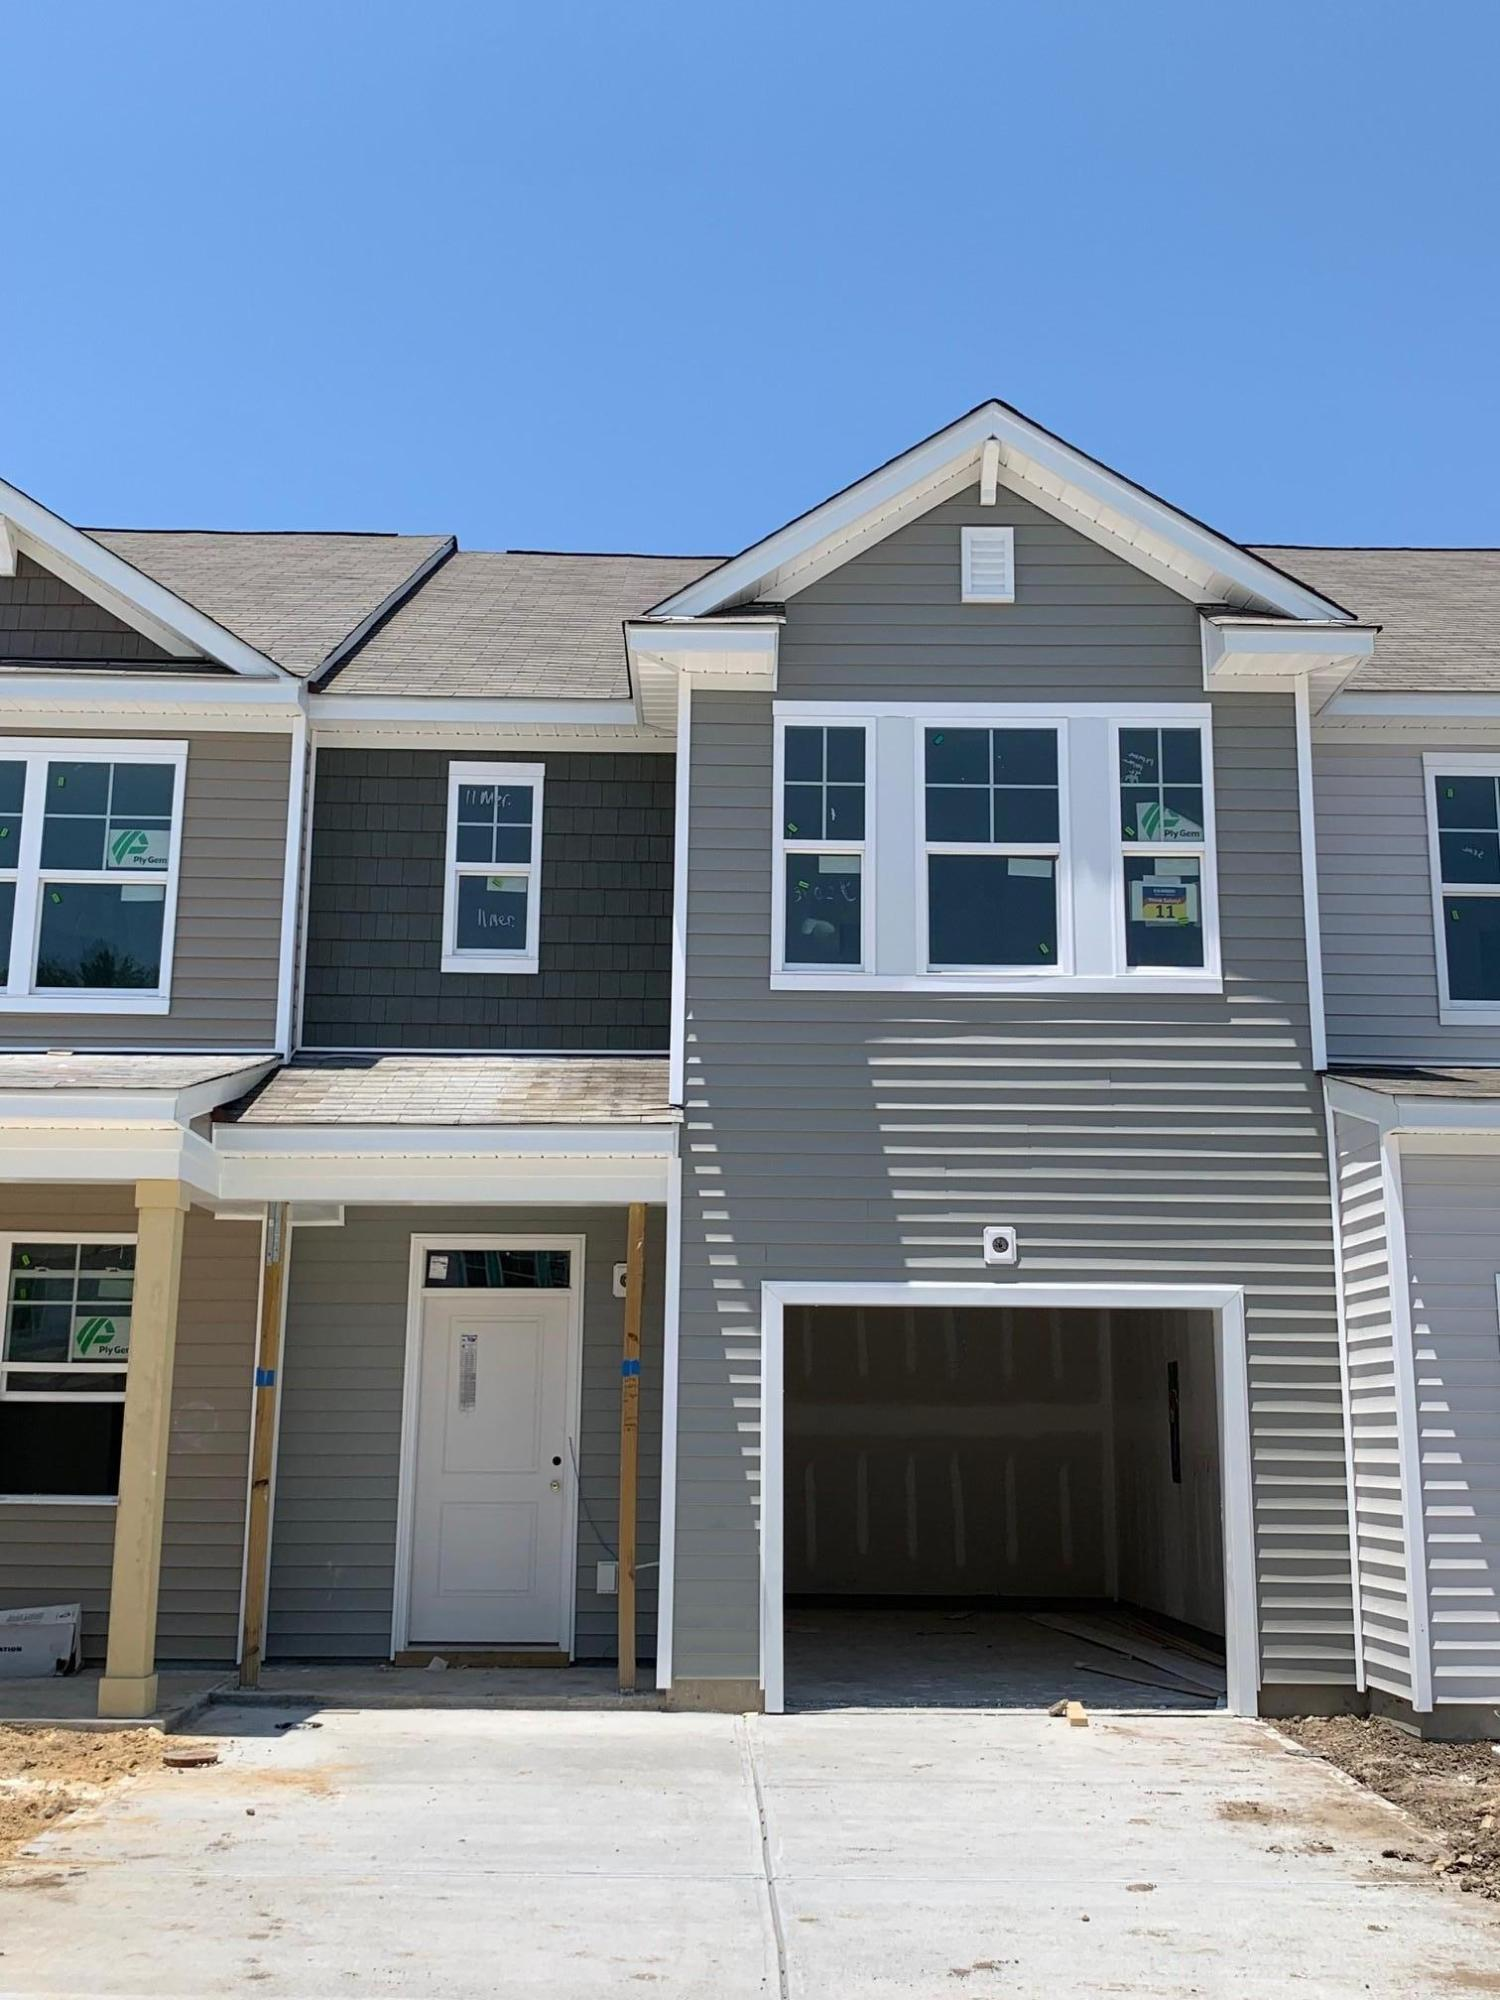 Cane Bay Plantation Homes For Sale - 625 Hilchot, Summerville, SC - 3